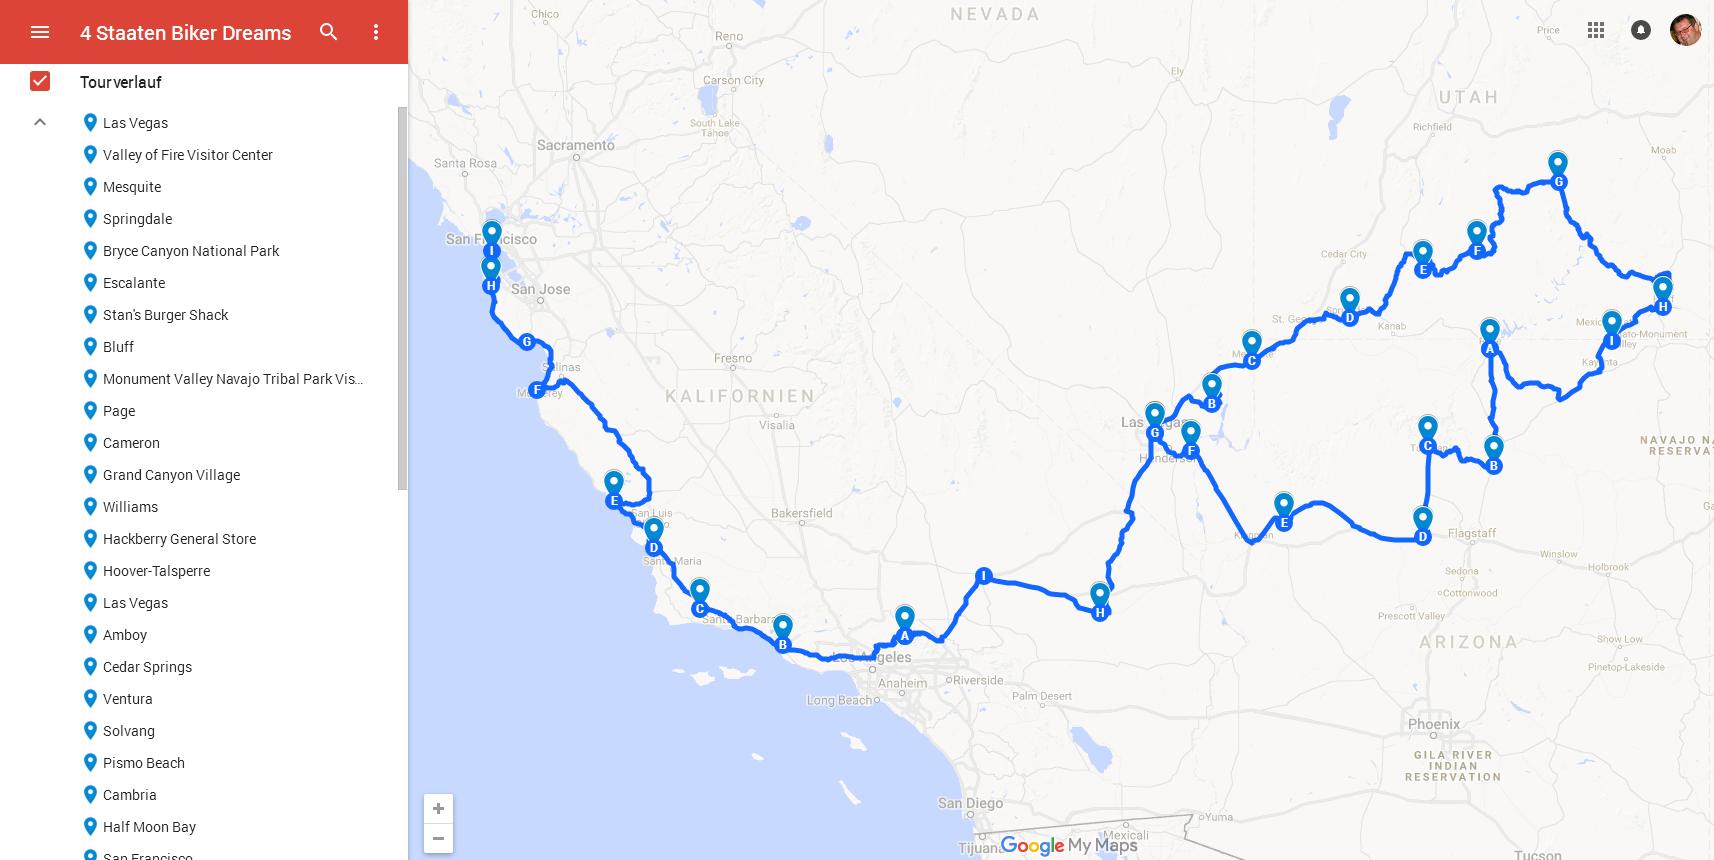 4 Staaten Biker Dreams - Amerika Heller Motorrad-Reisen